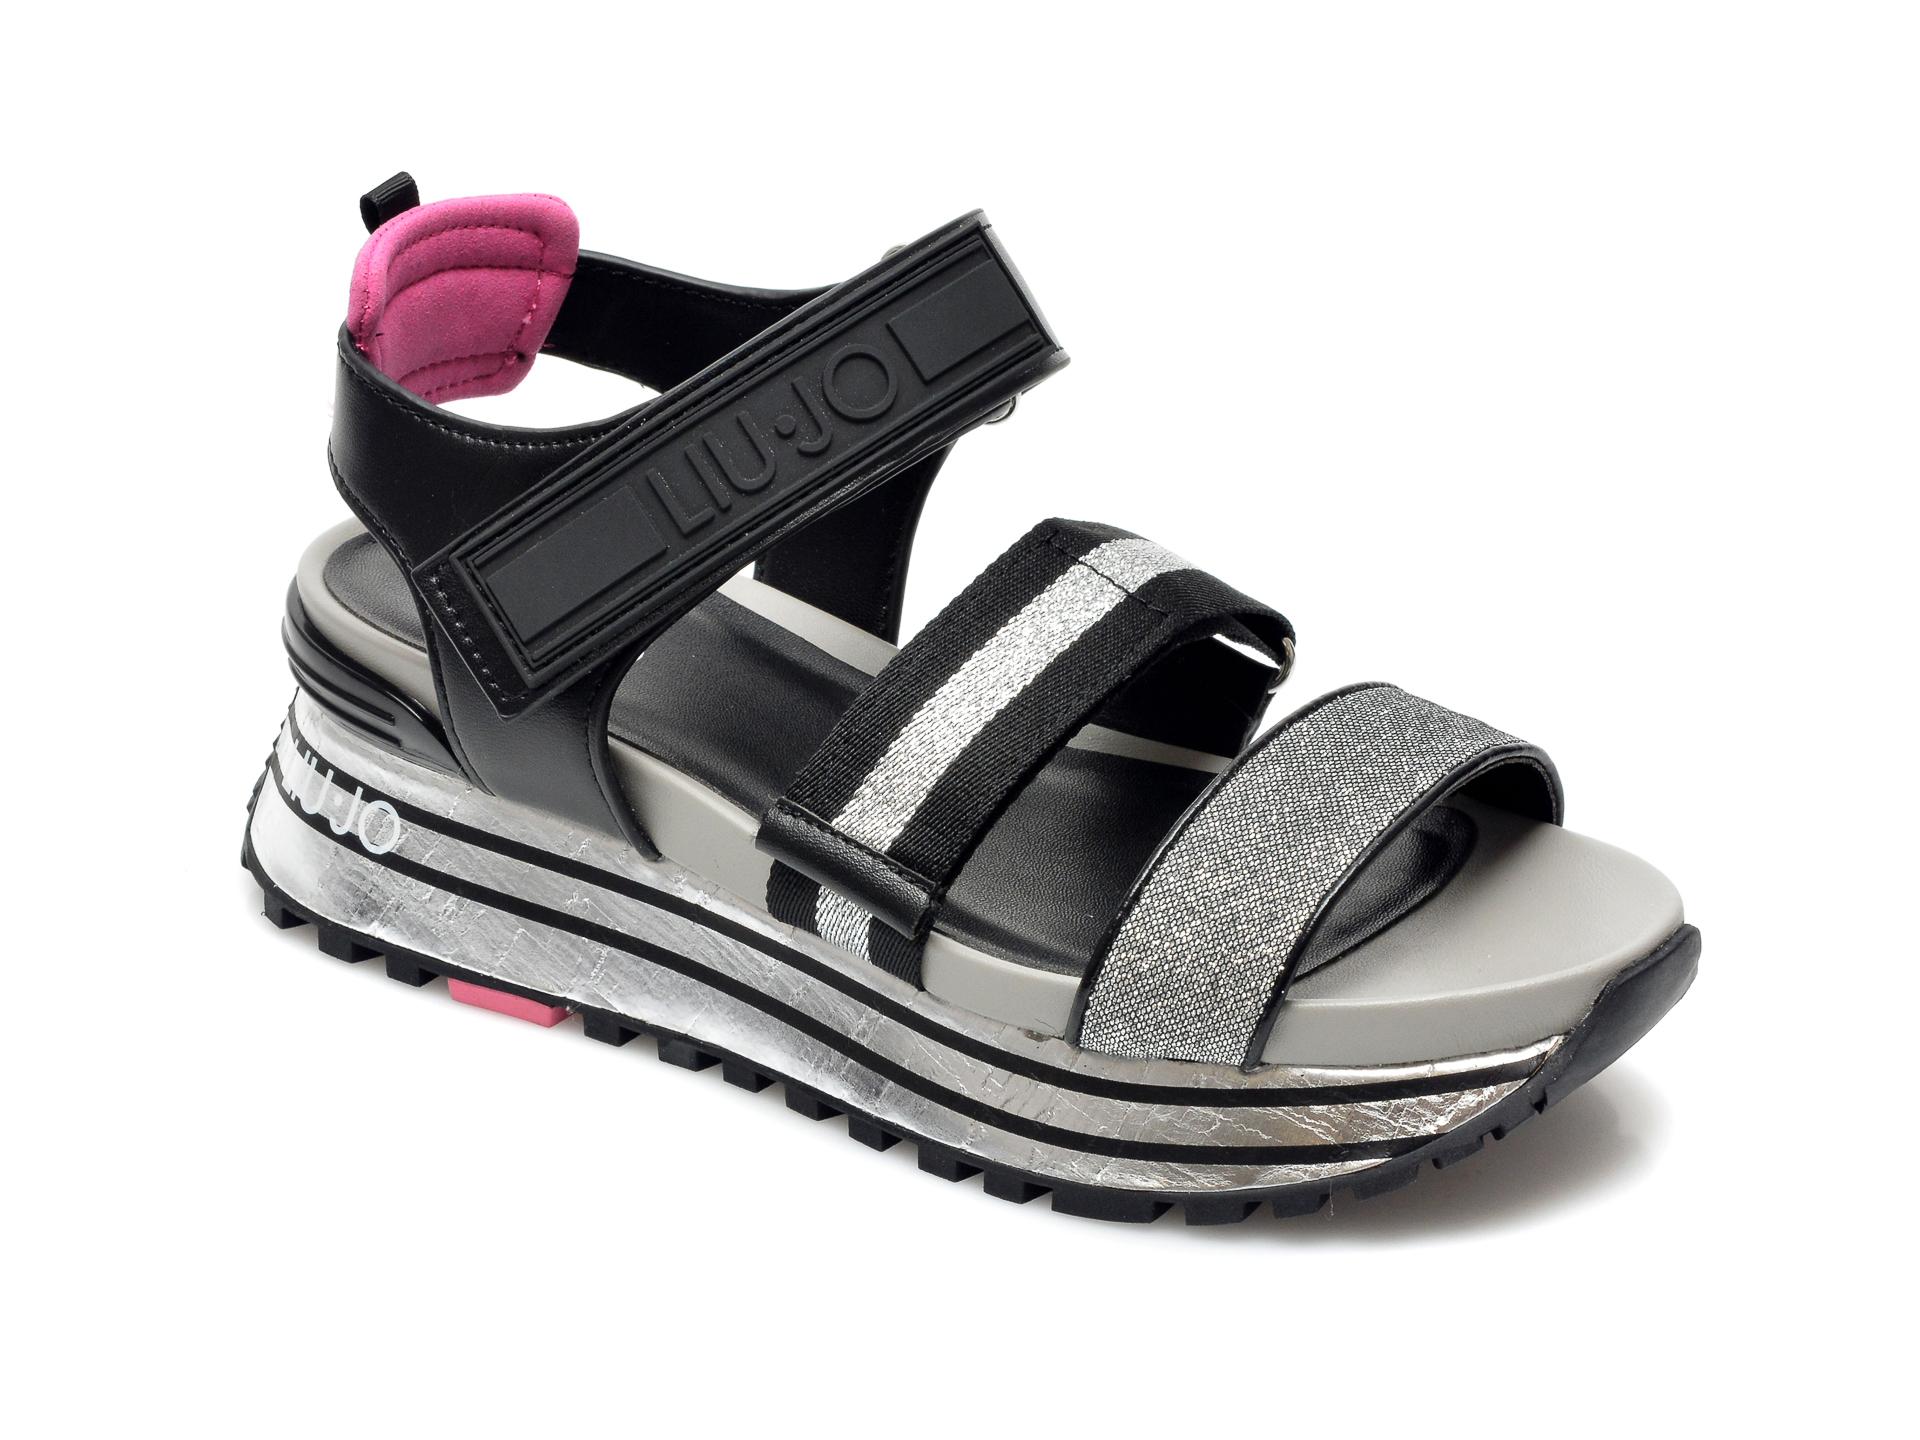 Sandale LIU JO argintii, Maxi Wonder Sandal , din material textil si piele ecologica imagine otter.ro